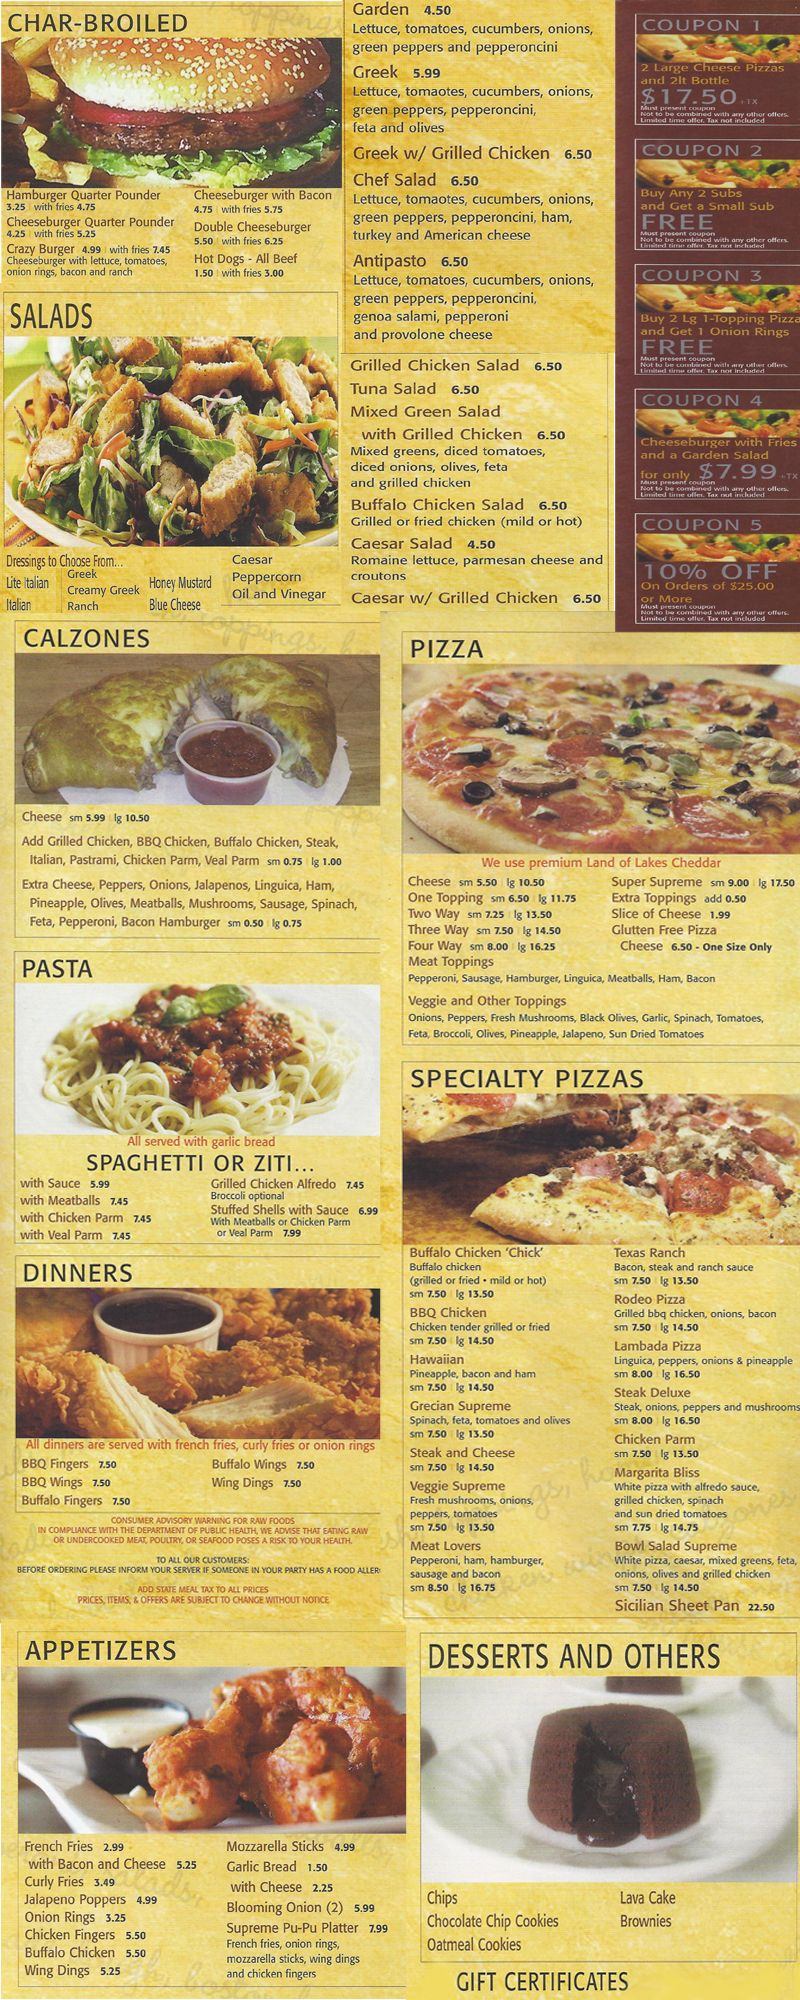 Supreme Pizza 1284S Main Street Brockton MA,02301 508-857-2767 ...